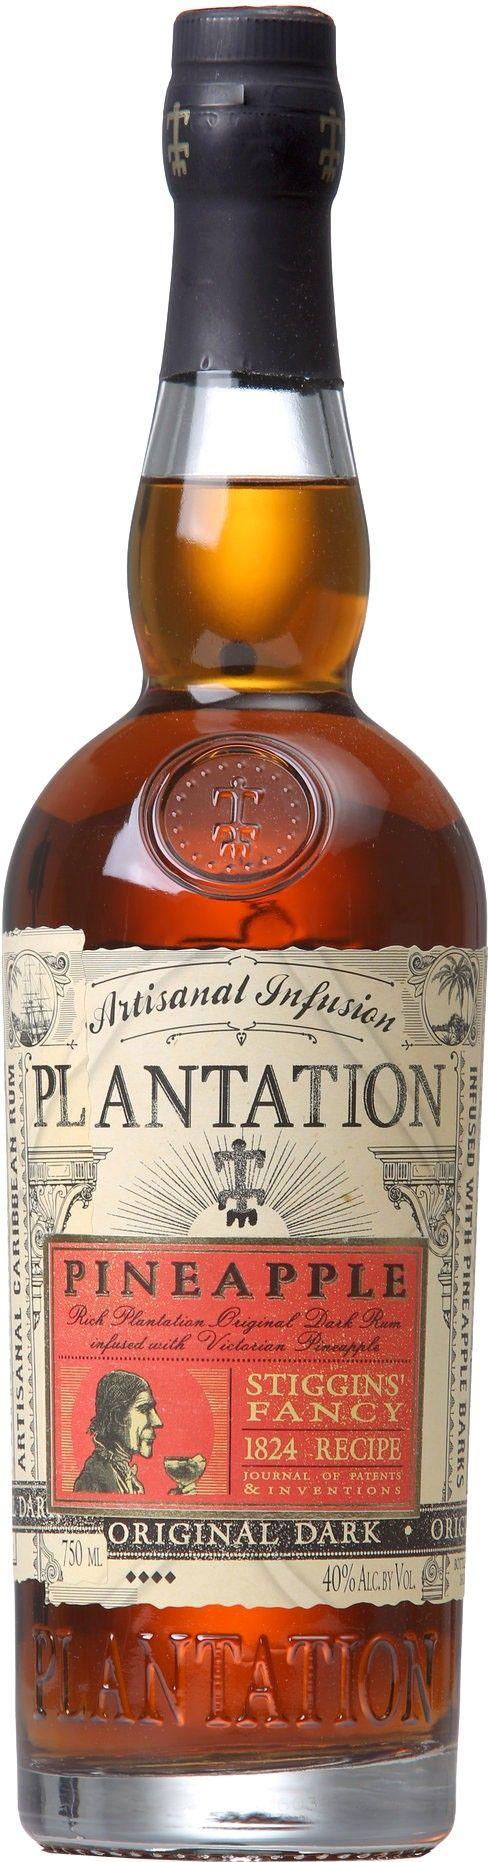 Plantation Stiggins' Fancy Dark Pineapple Rum | @Caskers